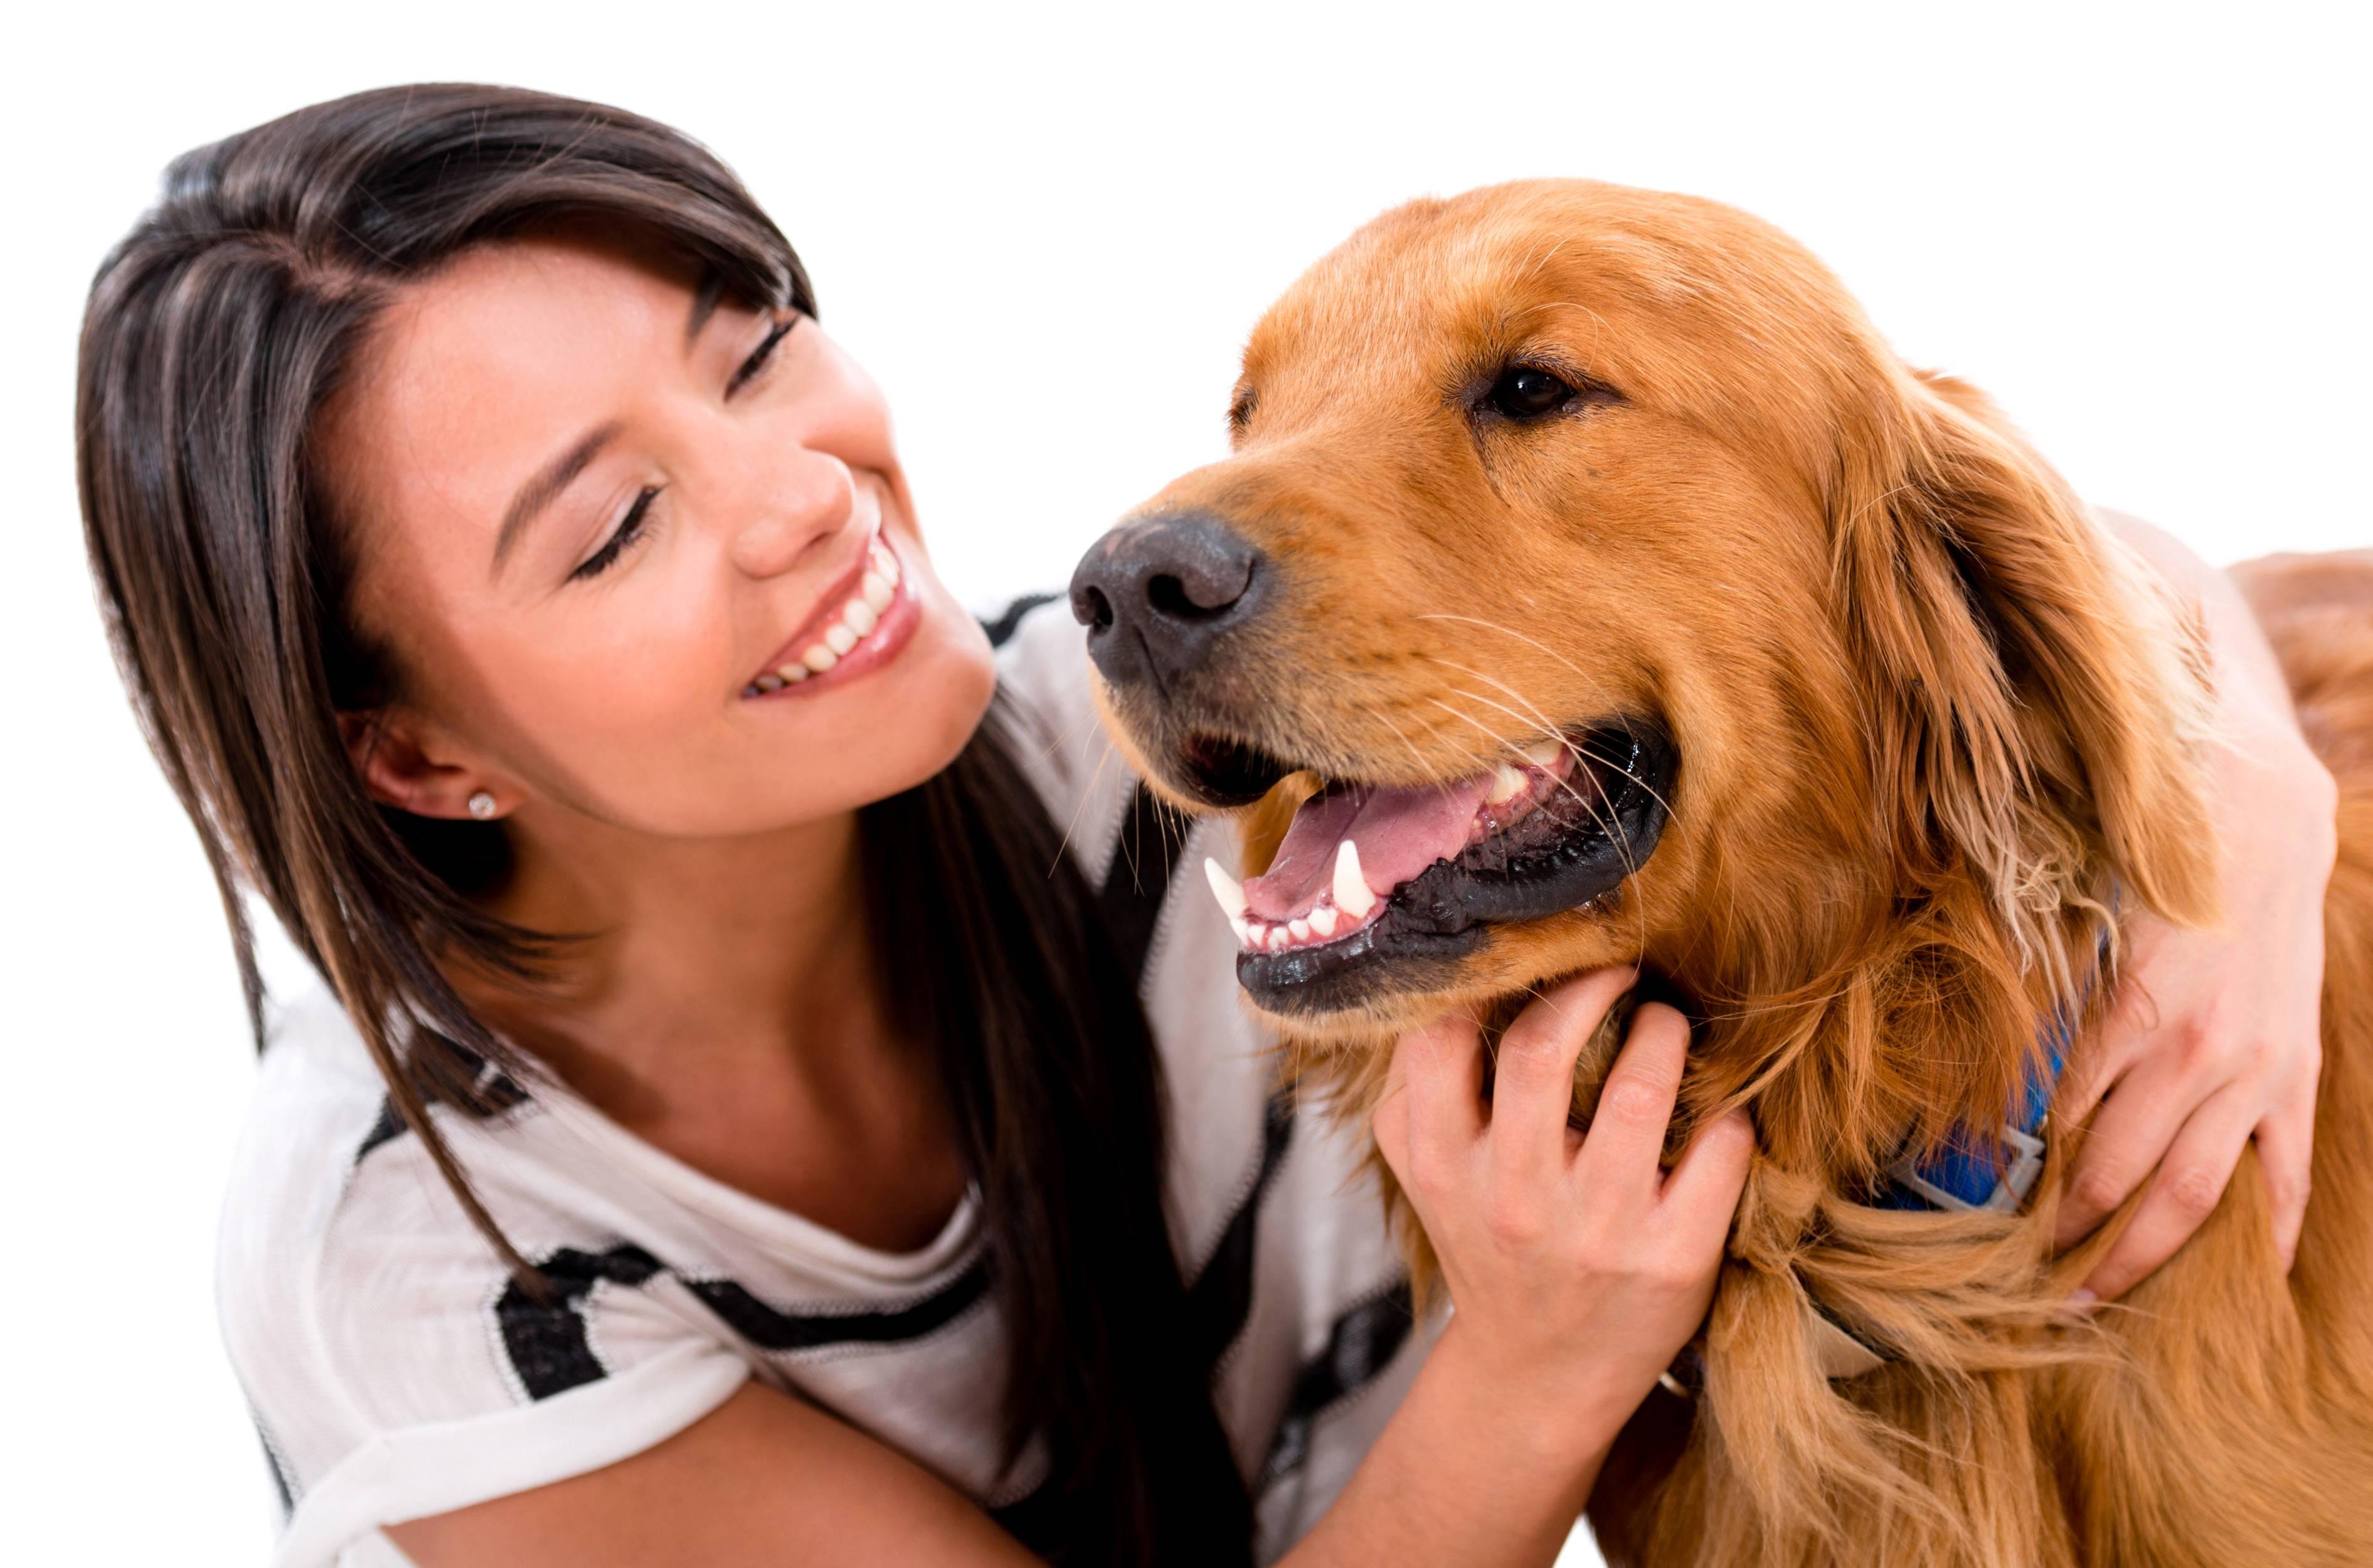 ᐉ 5 улыбающихся пород собак: могут ли собаки улыбаться - kcc-zoo.ru